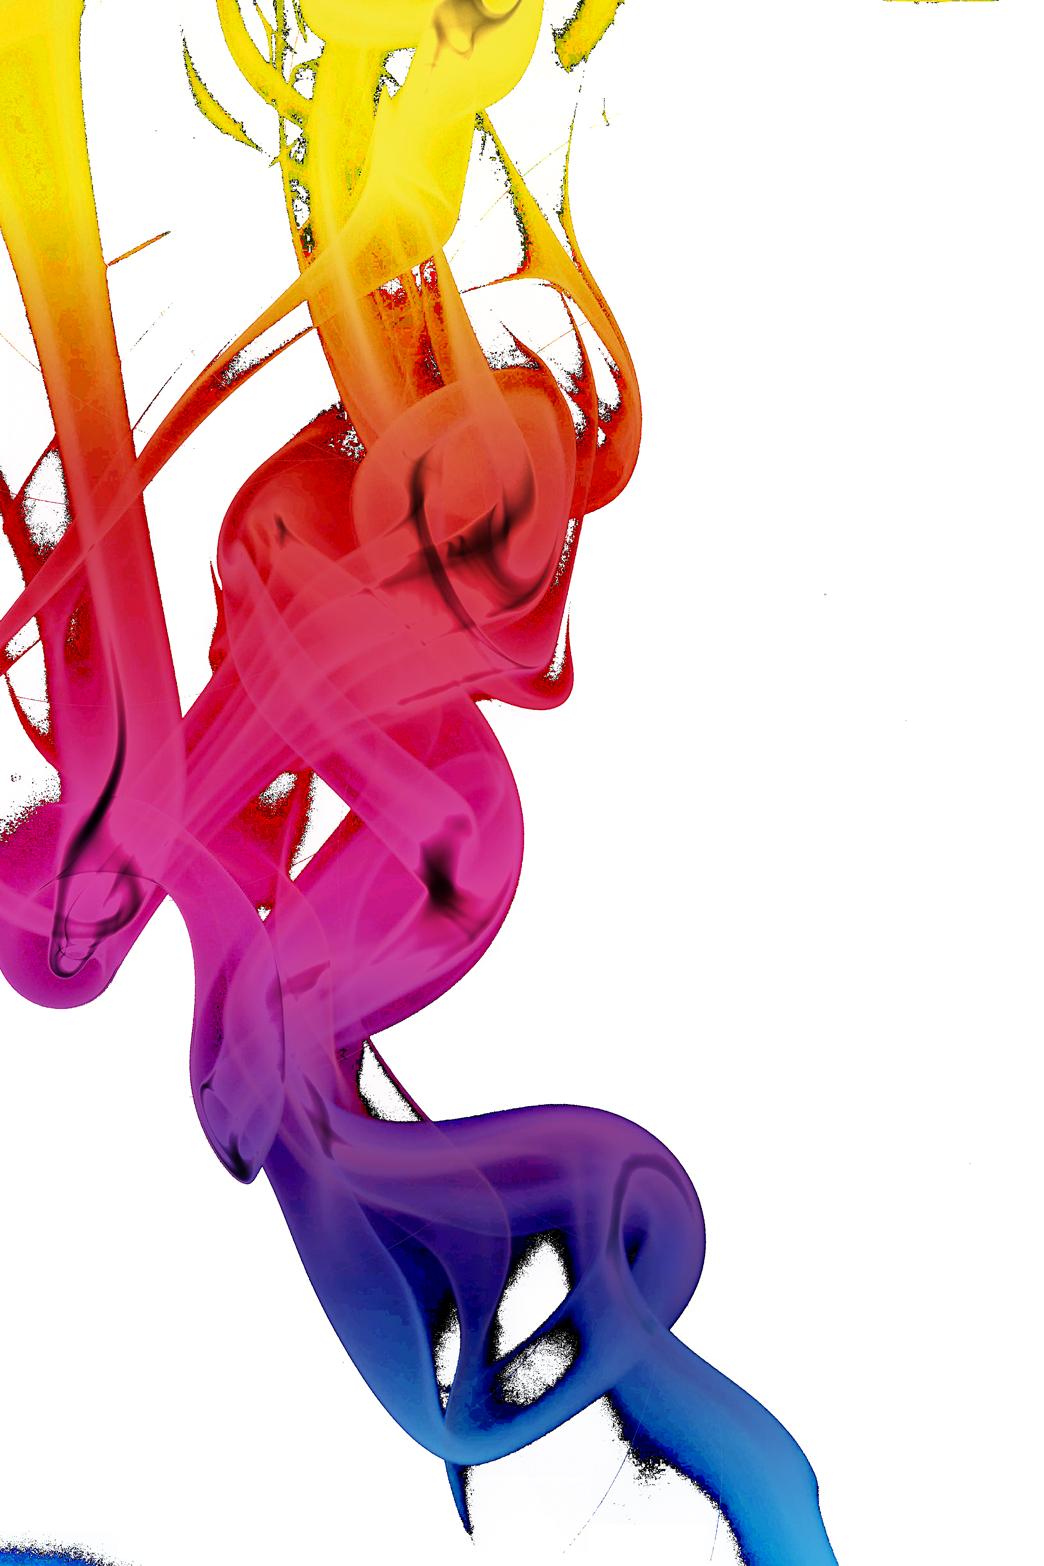 Colorful Smoke PNG Image | I like | Pinterest | Colorful smoke for rainbow smoke transparent  585eri